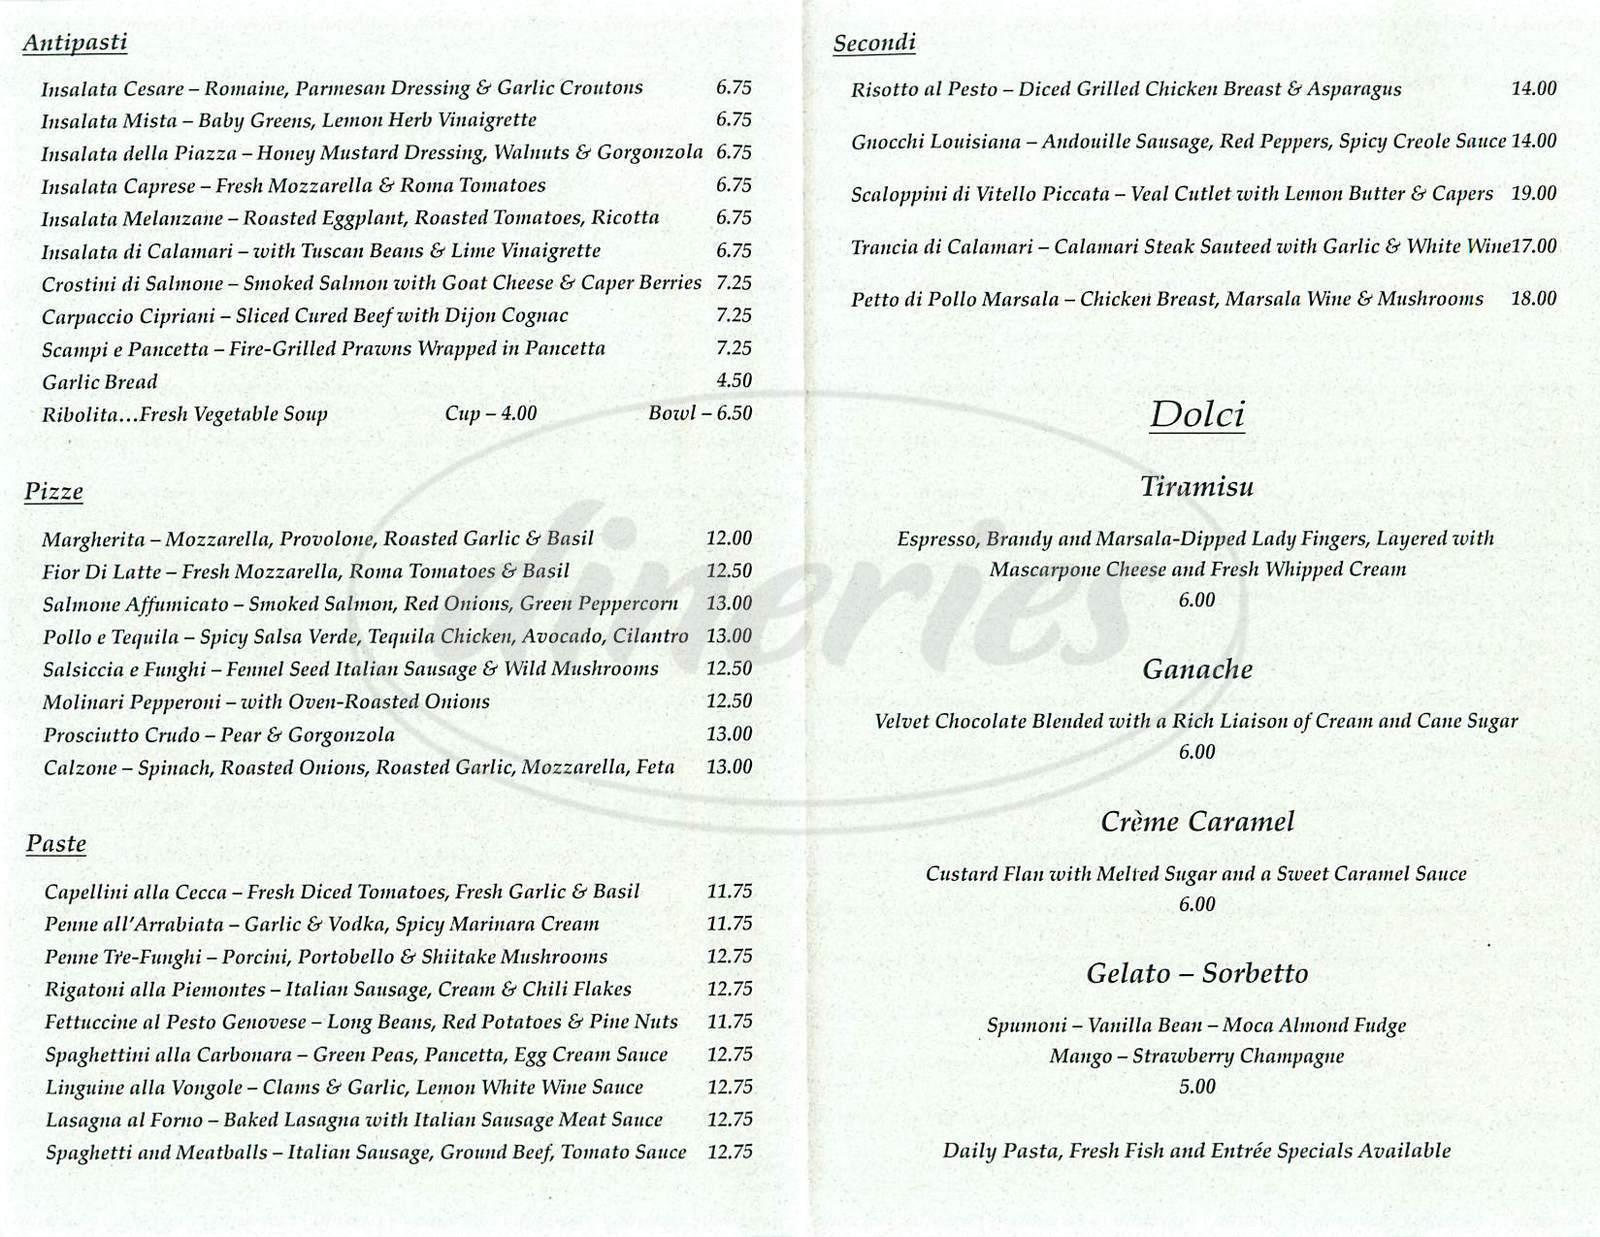 menu for La Piazza